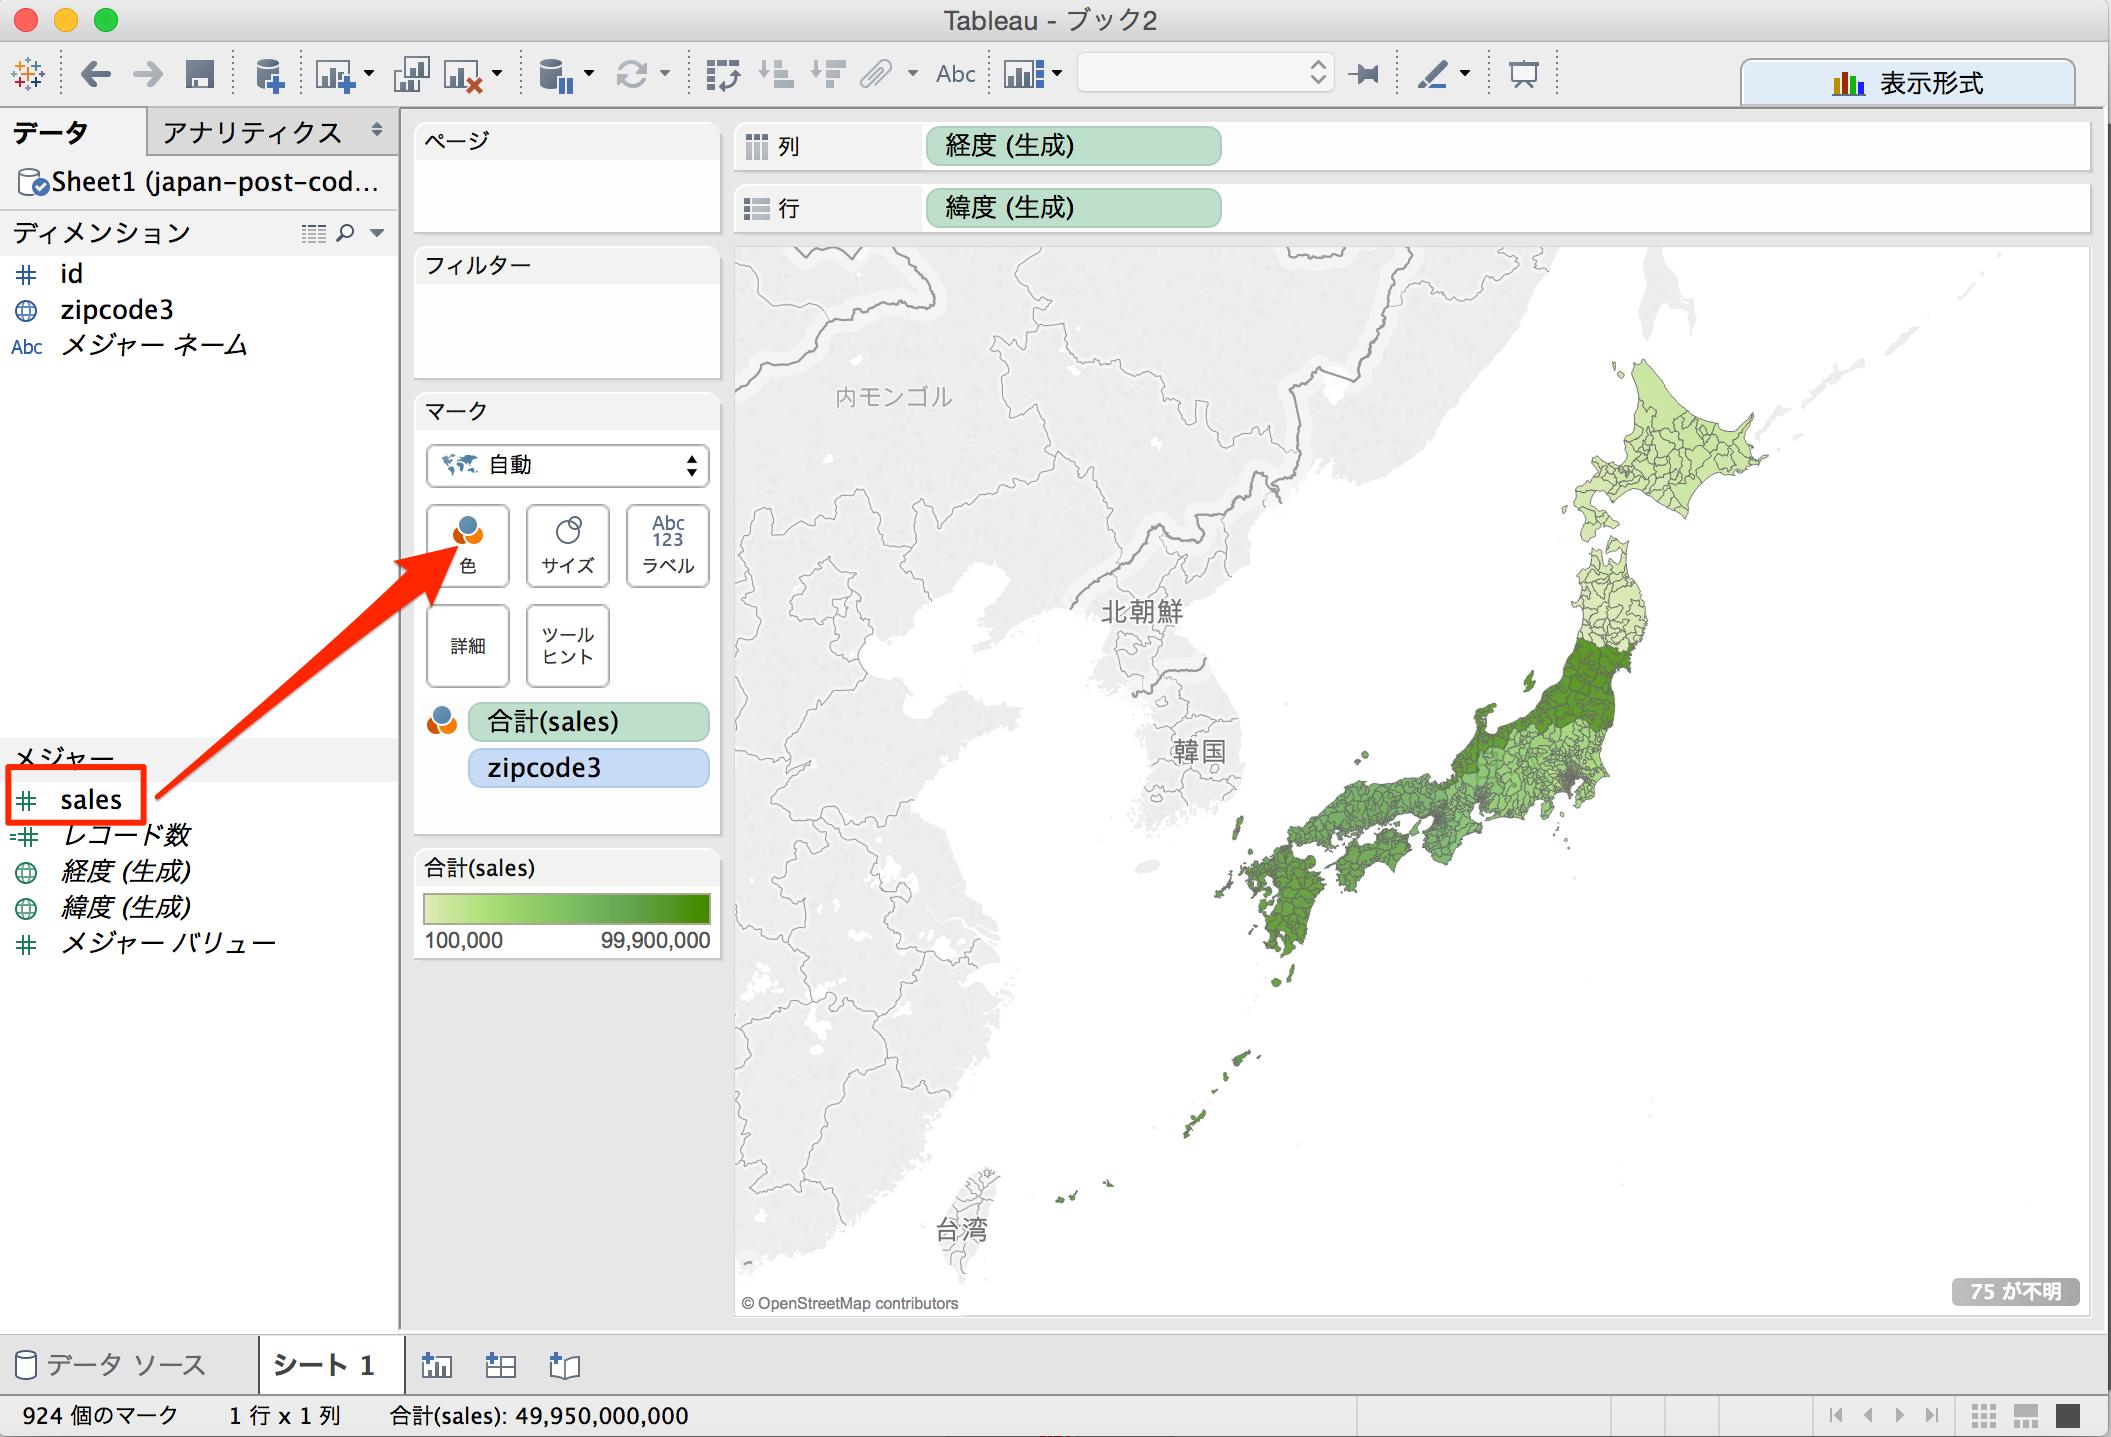 tableau92-japanese-post-code_sample_05